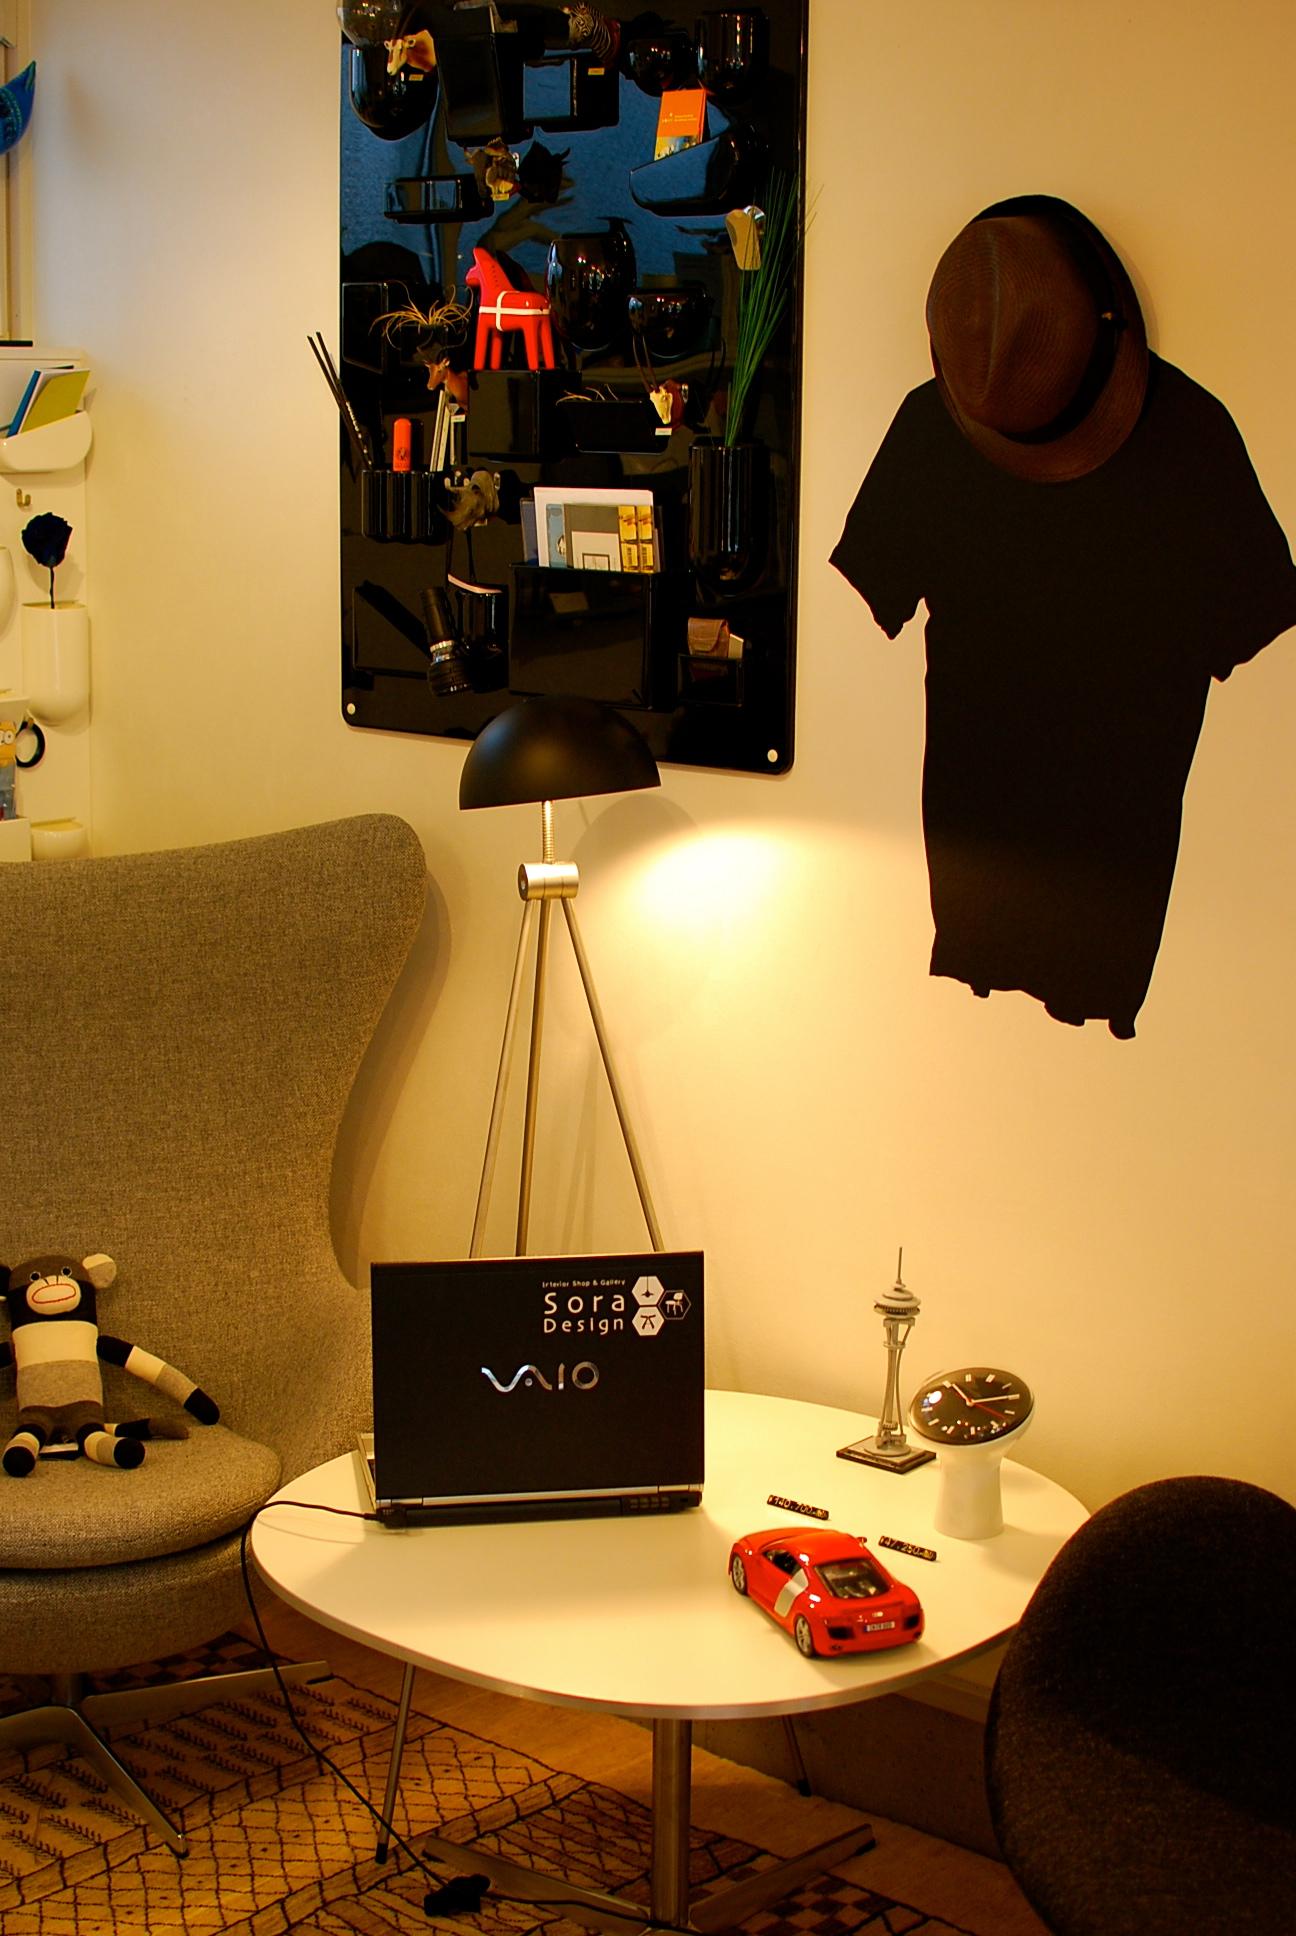 http://www.sora-design.com/images/bl-517.jpg